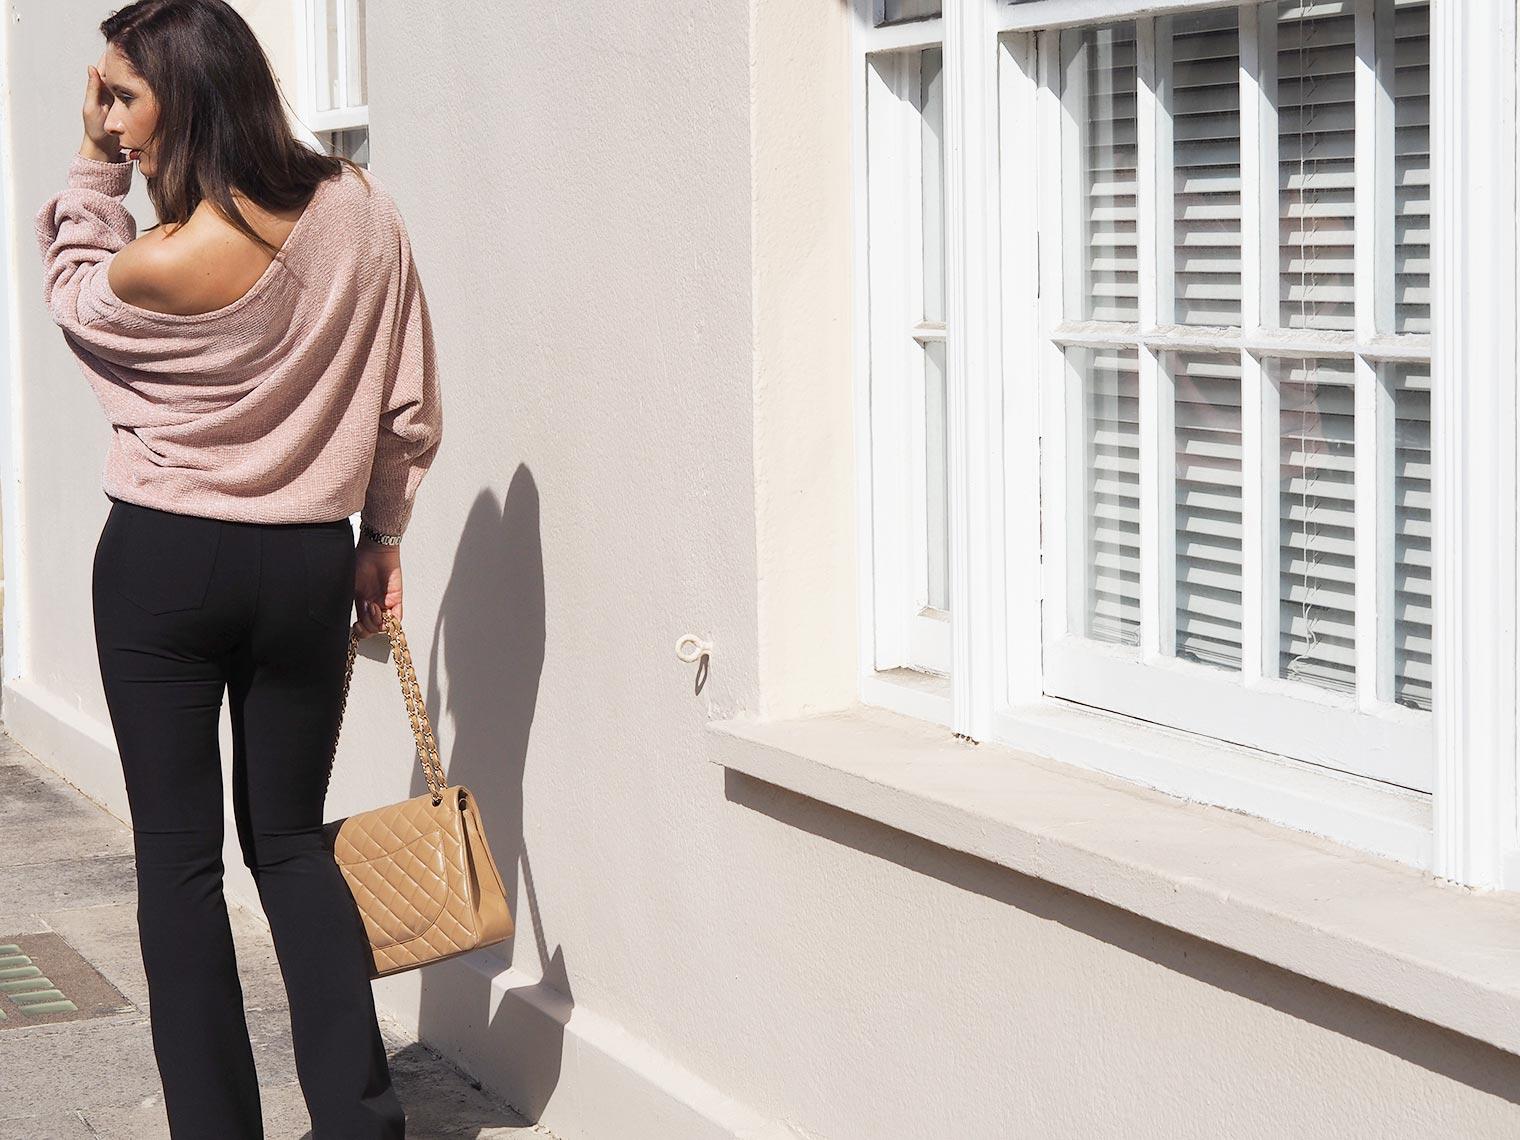 Autumn knit trends off the shoulder